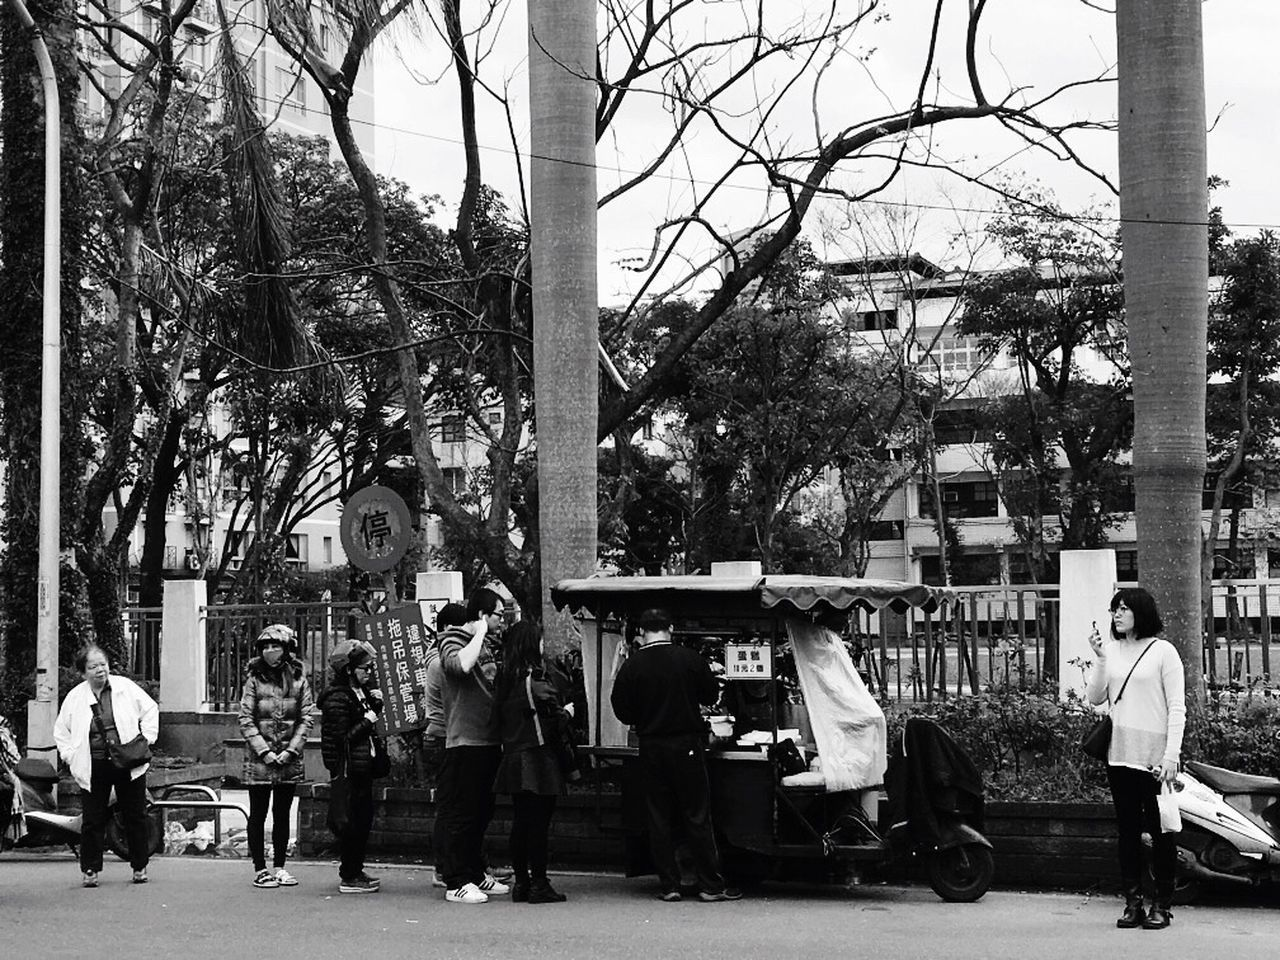 Vendor carts。 EyeEm Gallery EyeEm Best Shots - Black + White TOWNSCAPE Taking Photos The Tourist Image Enjoying Life Lifestyle Photography Street Photography Street Foodphotography People Photography People Streetphotography